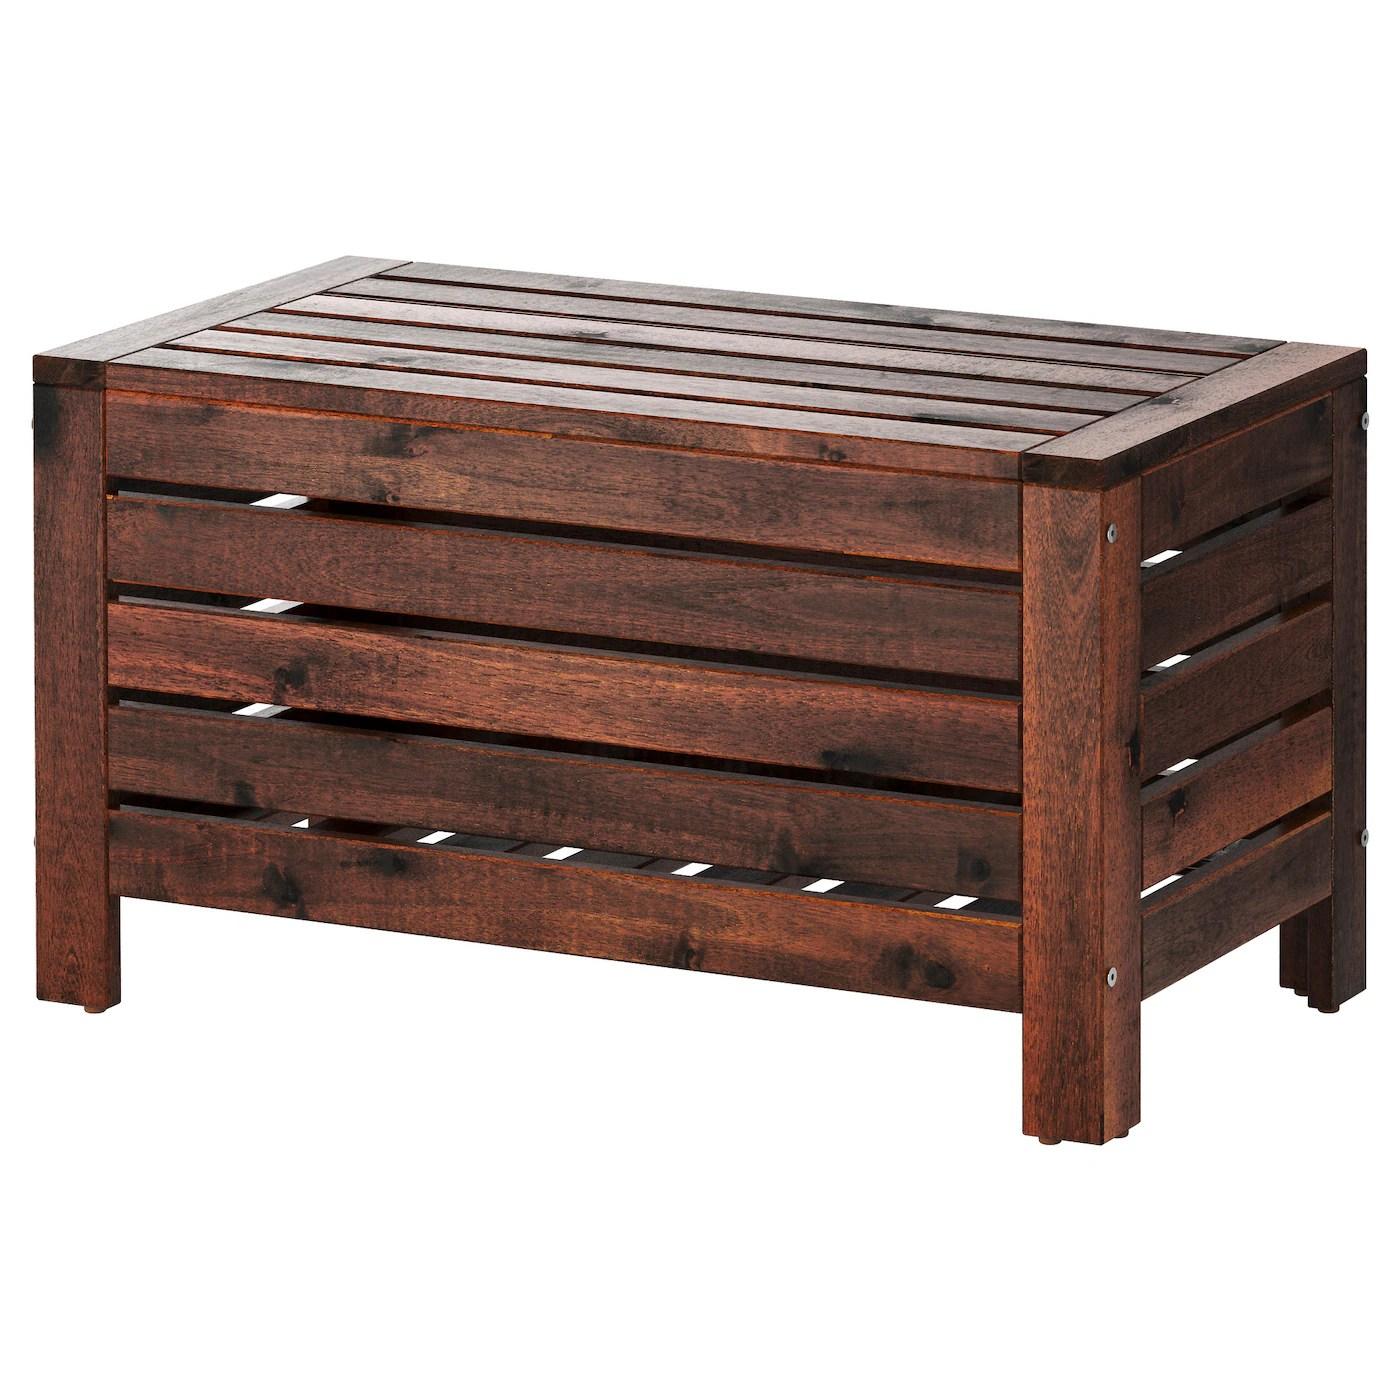 applaro banc rangement exterieur teinte brun 80x41 cm